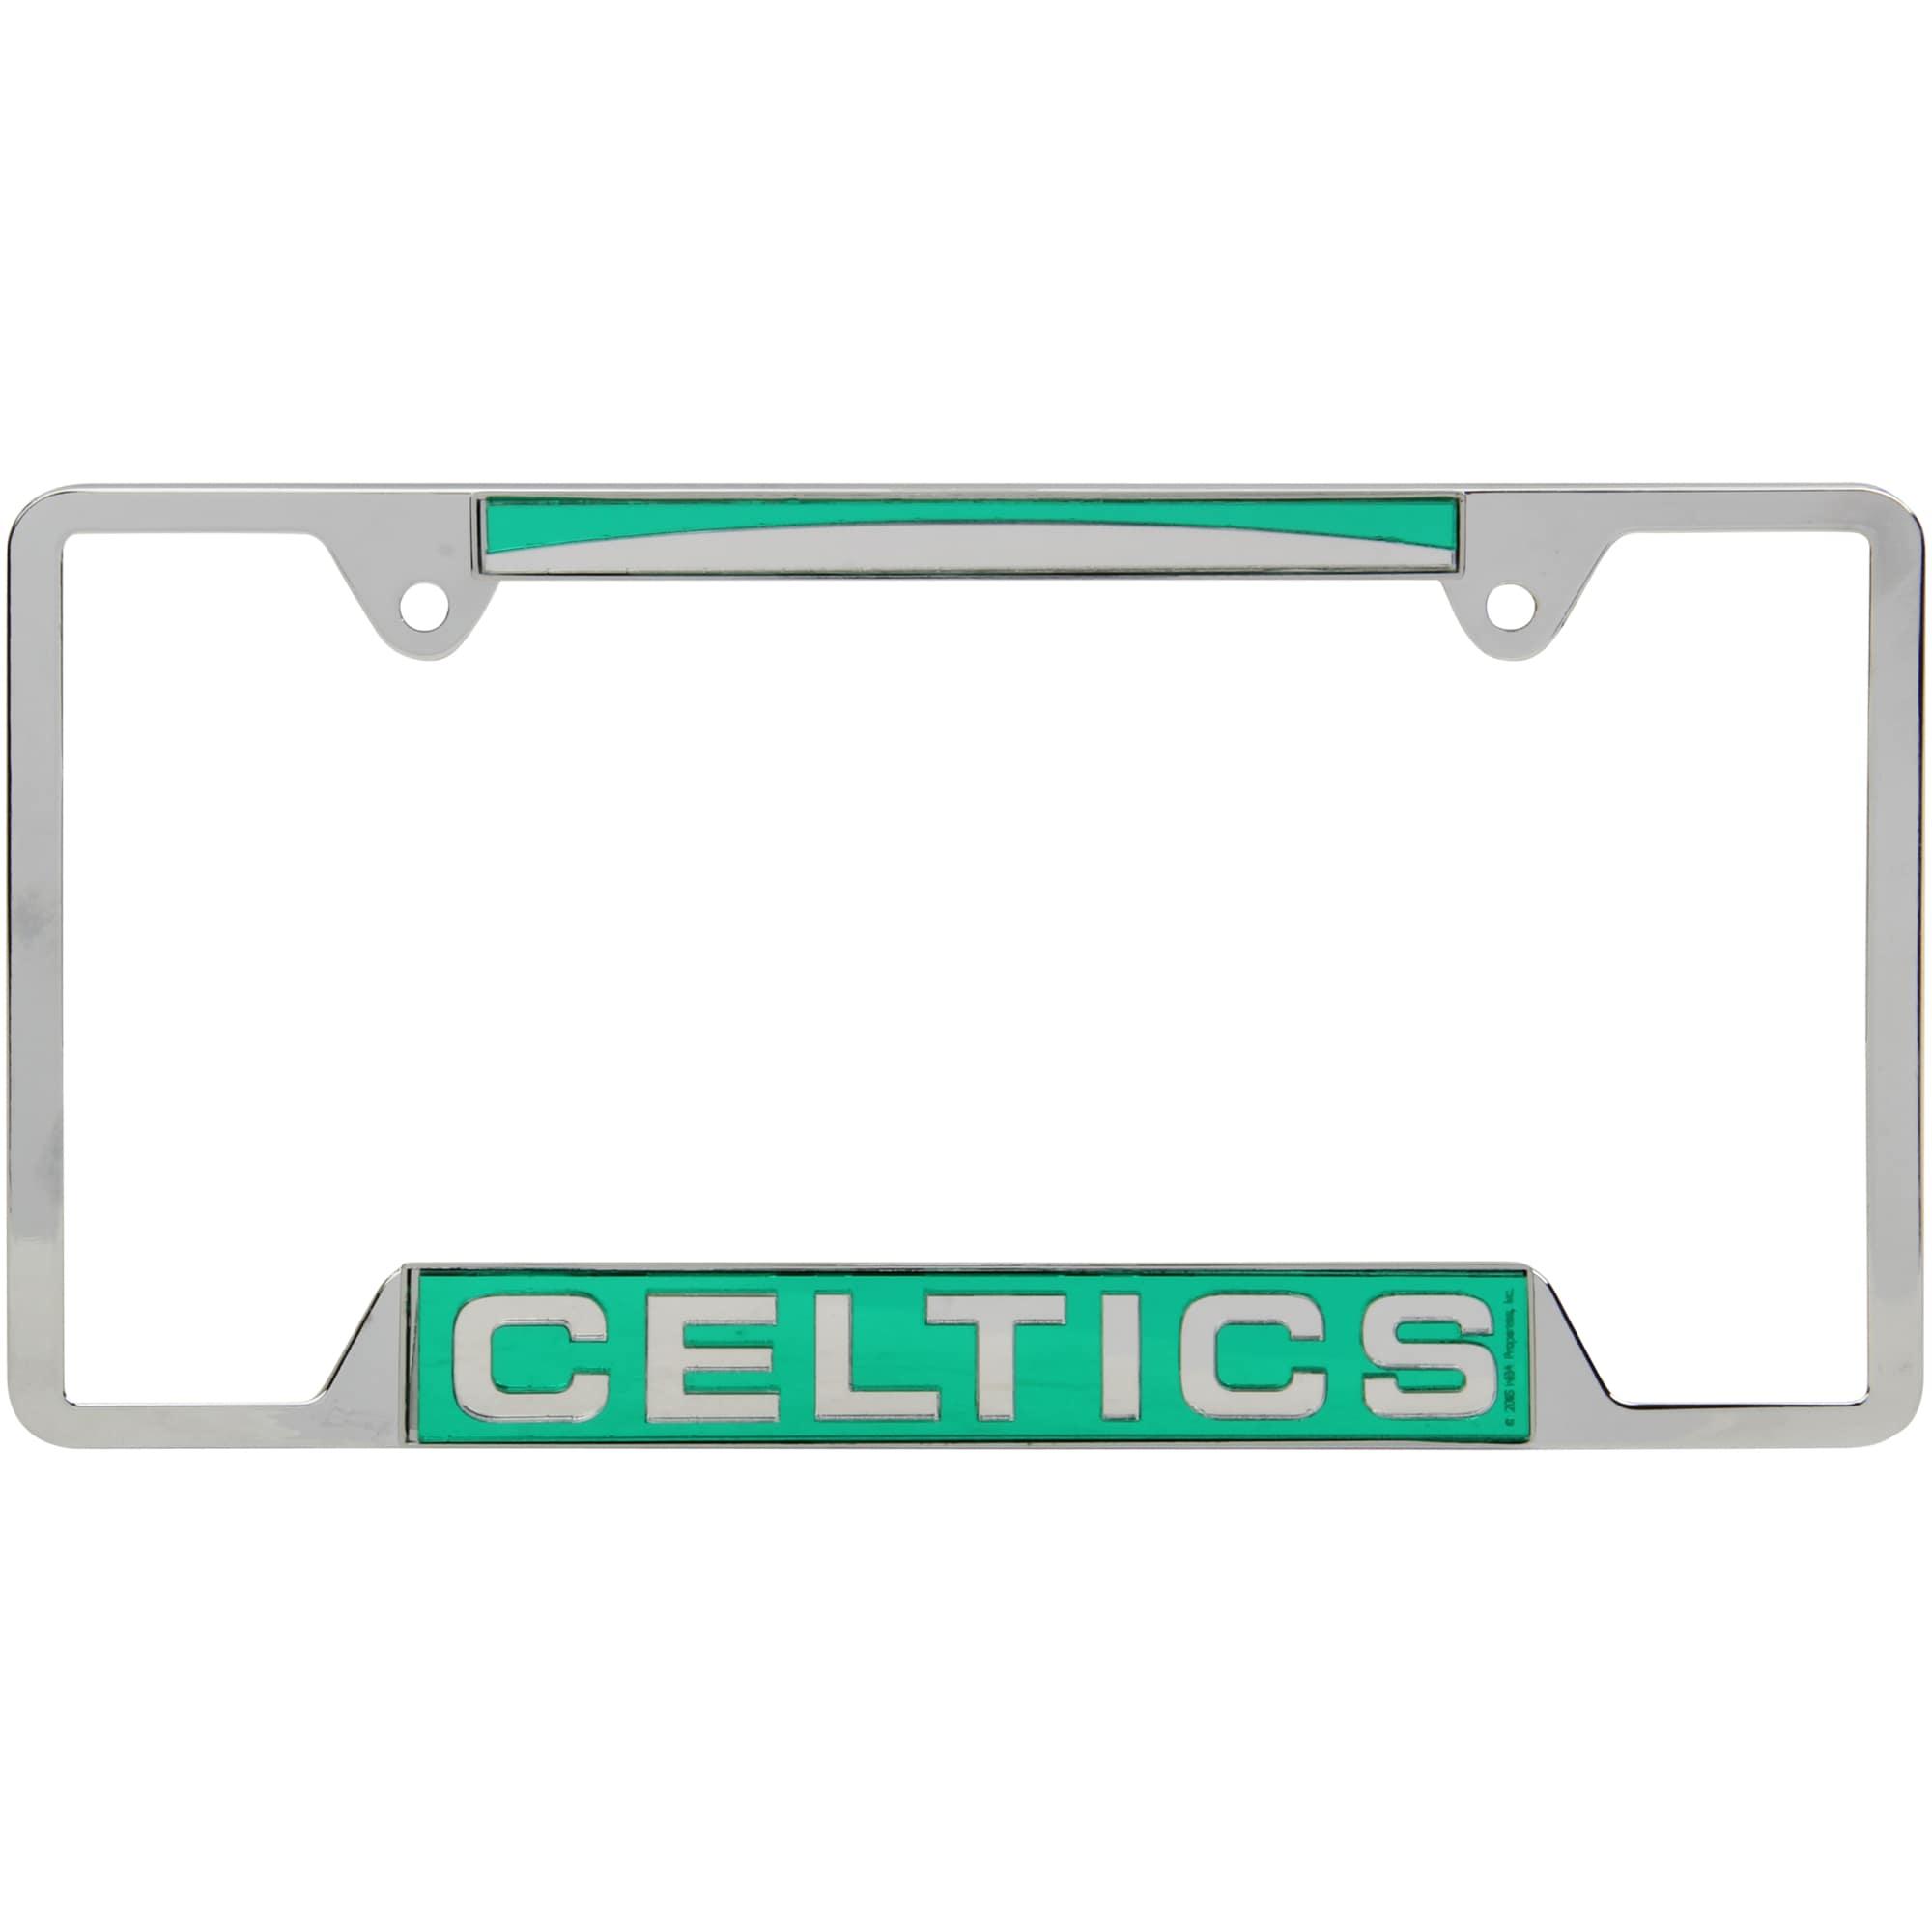 Boston Celtics WinCraft 4-Tab Style Inlaid Metal License Plate Frame